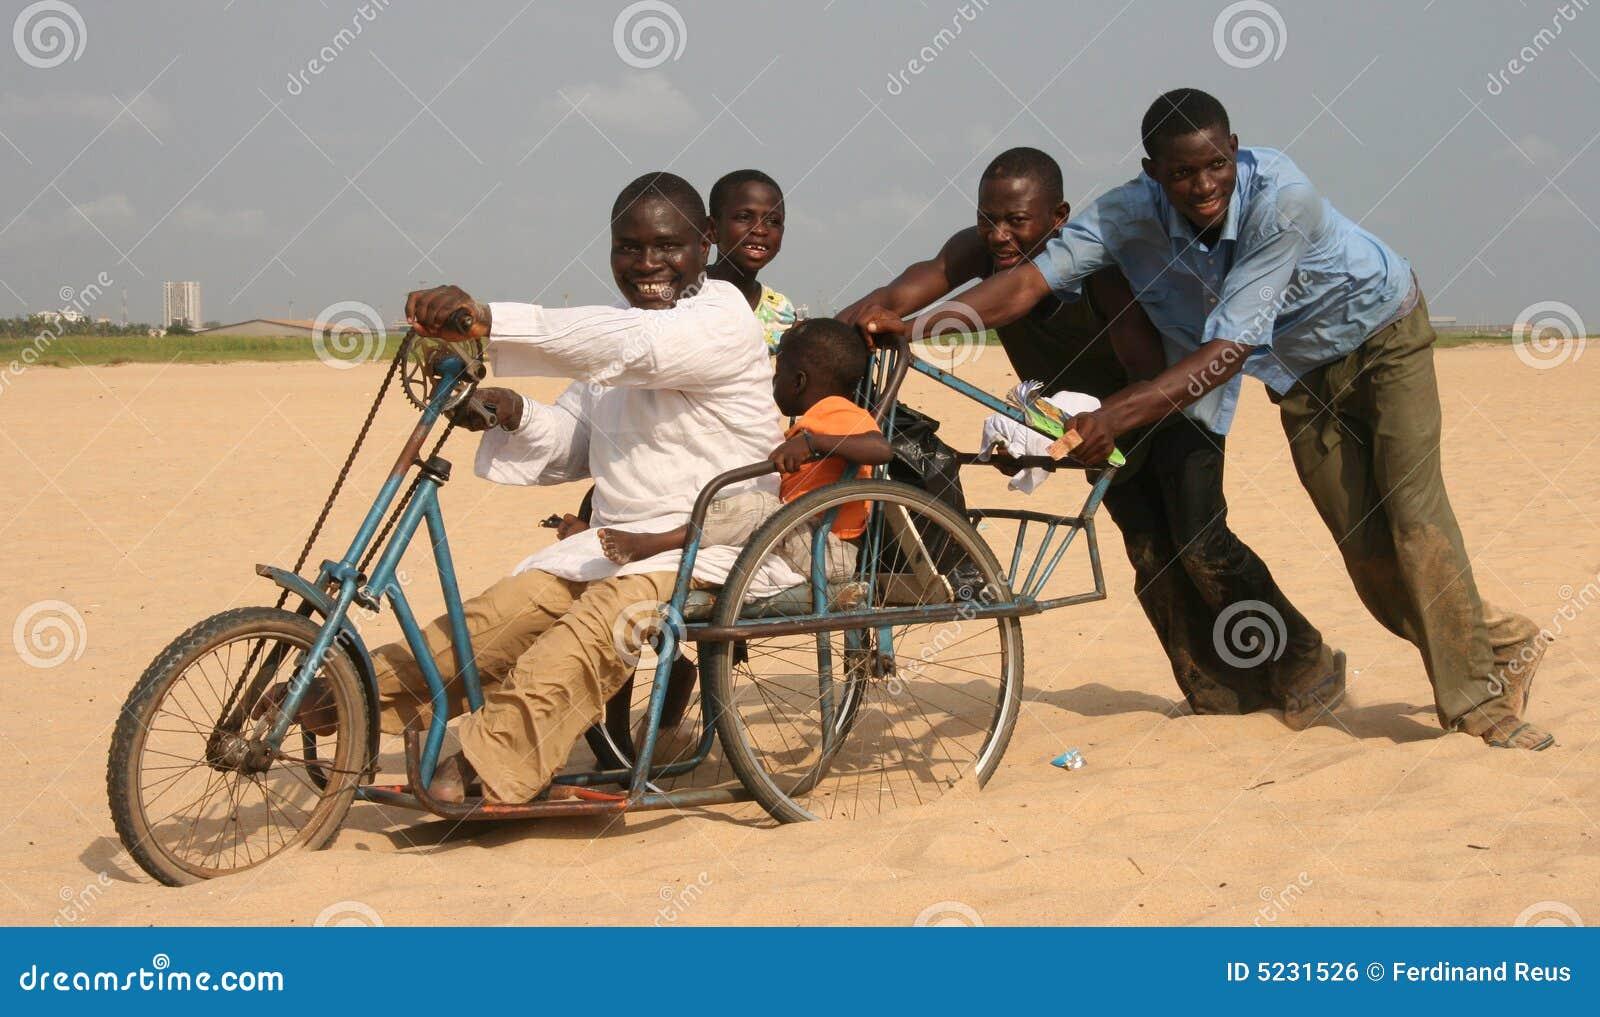 The joy of Africa